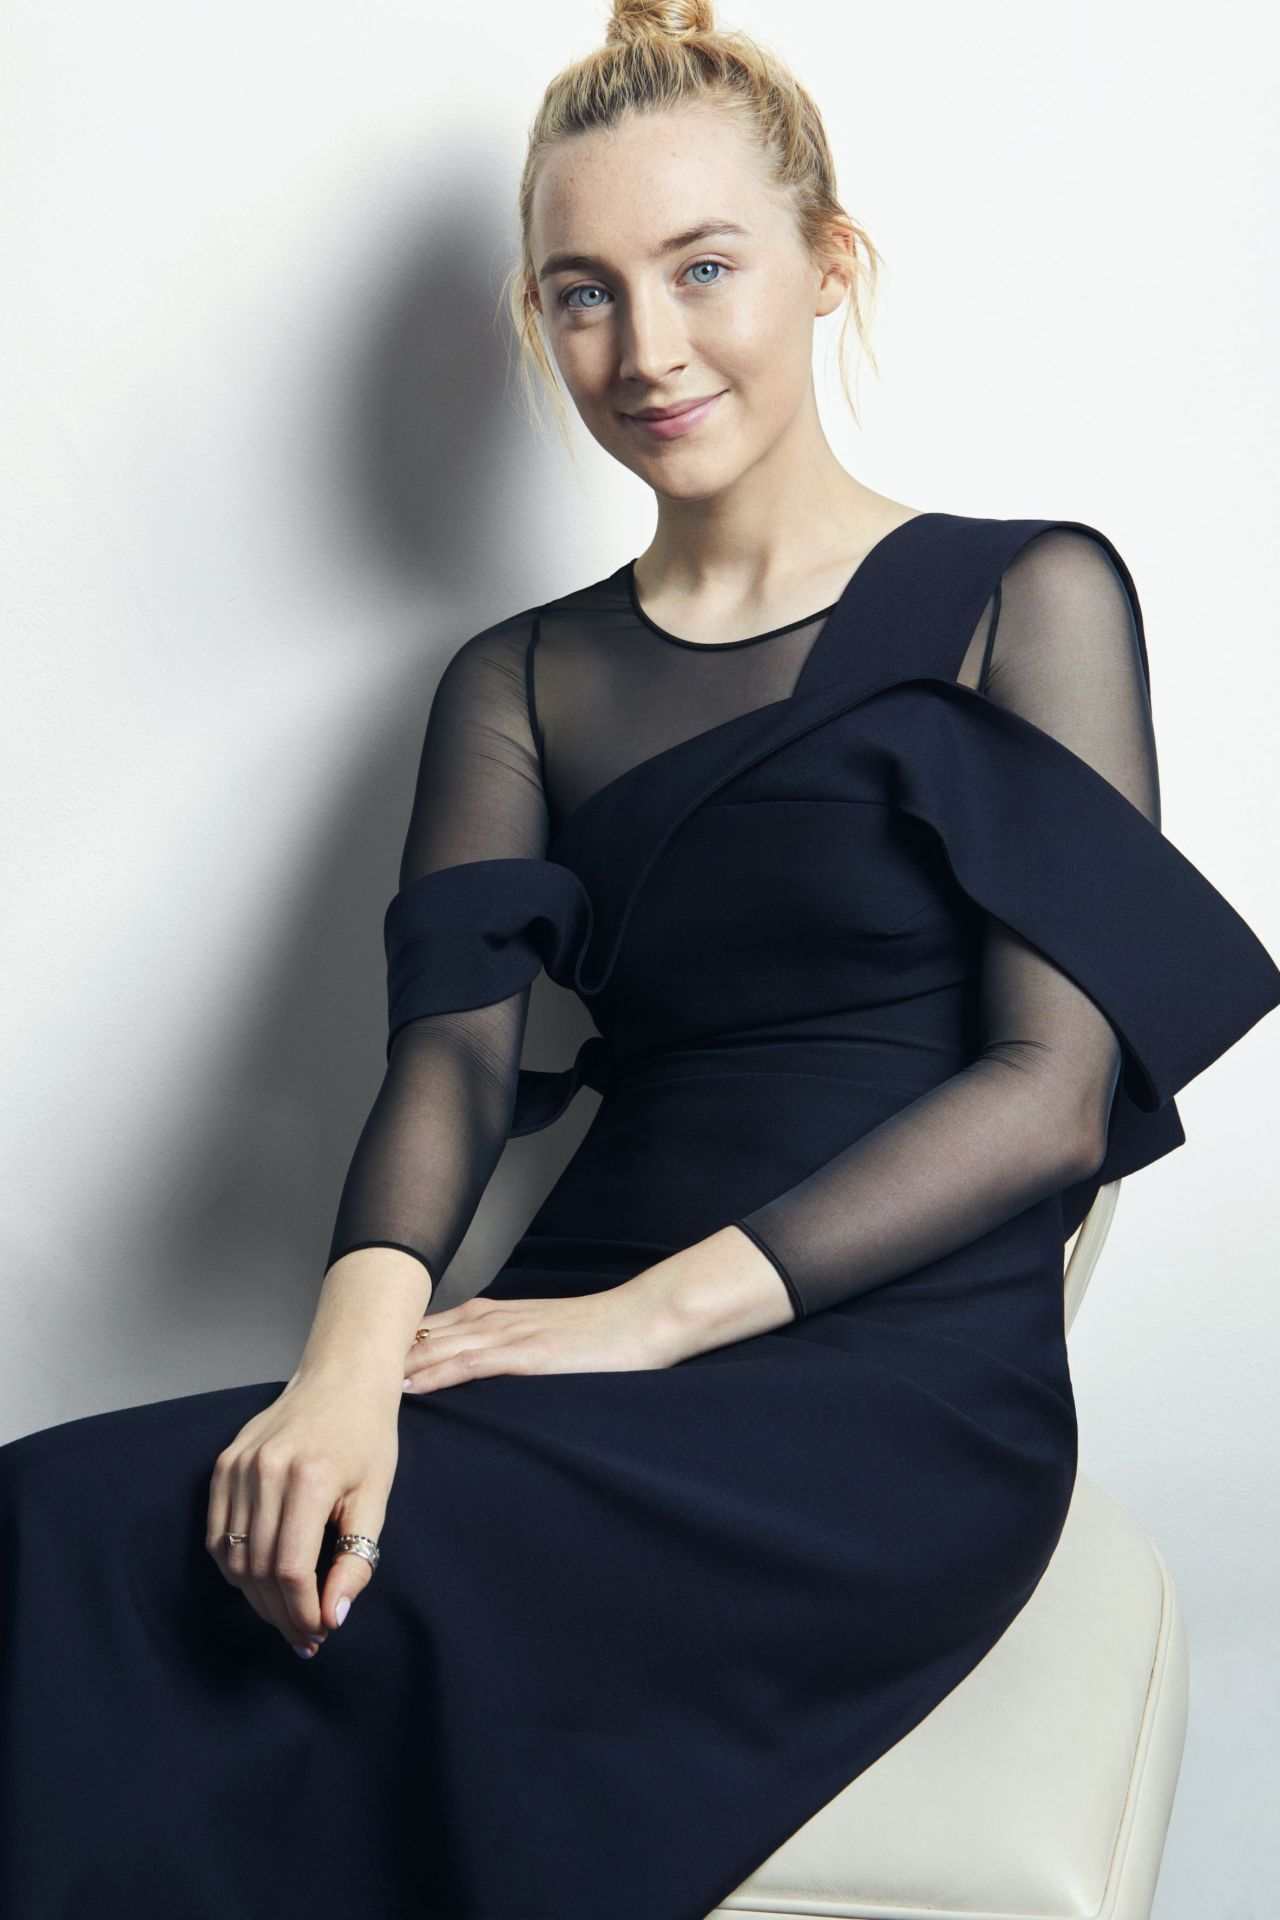 http://celebmafia.com/wp-content/uploads/2018/05/saoirse-ronan-spur-magazine-japan-july-2018-1.jpg